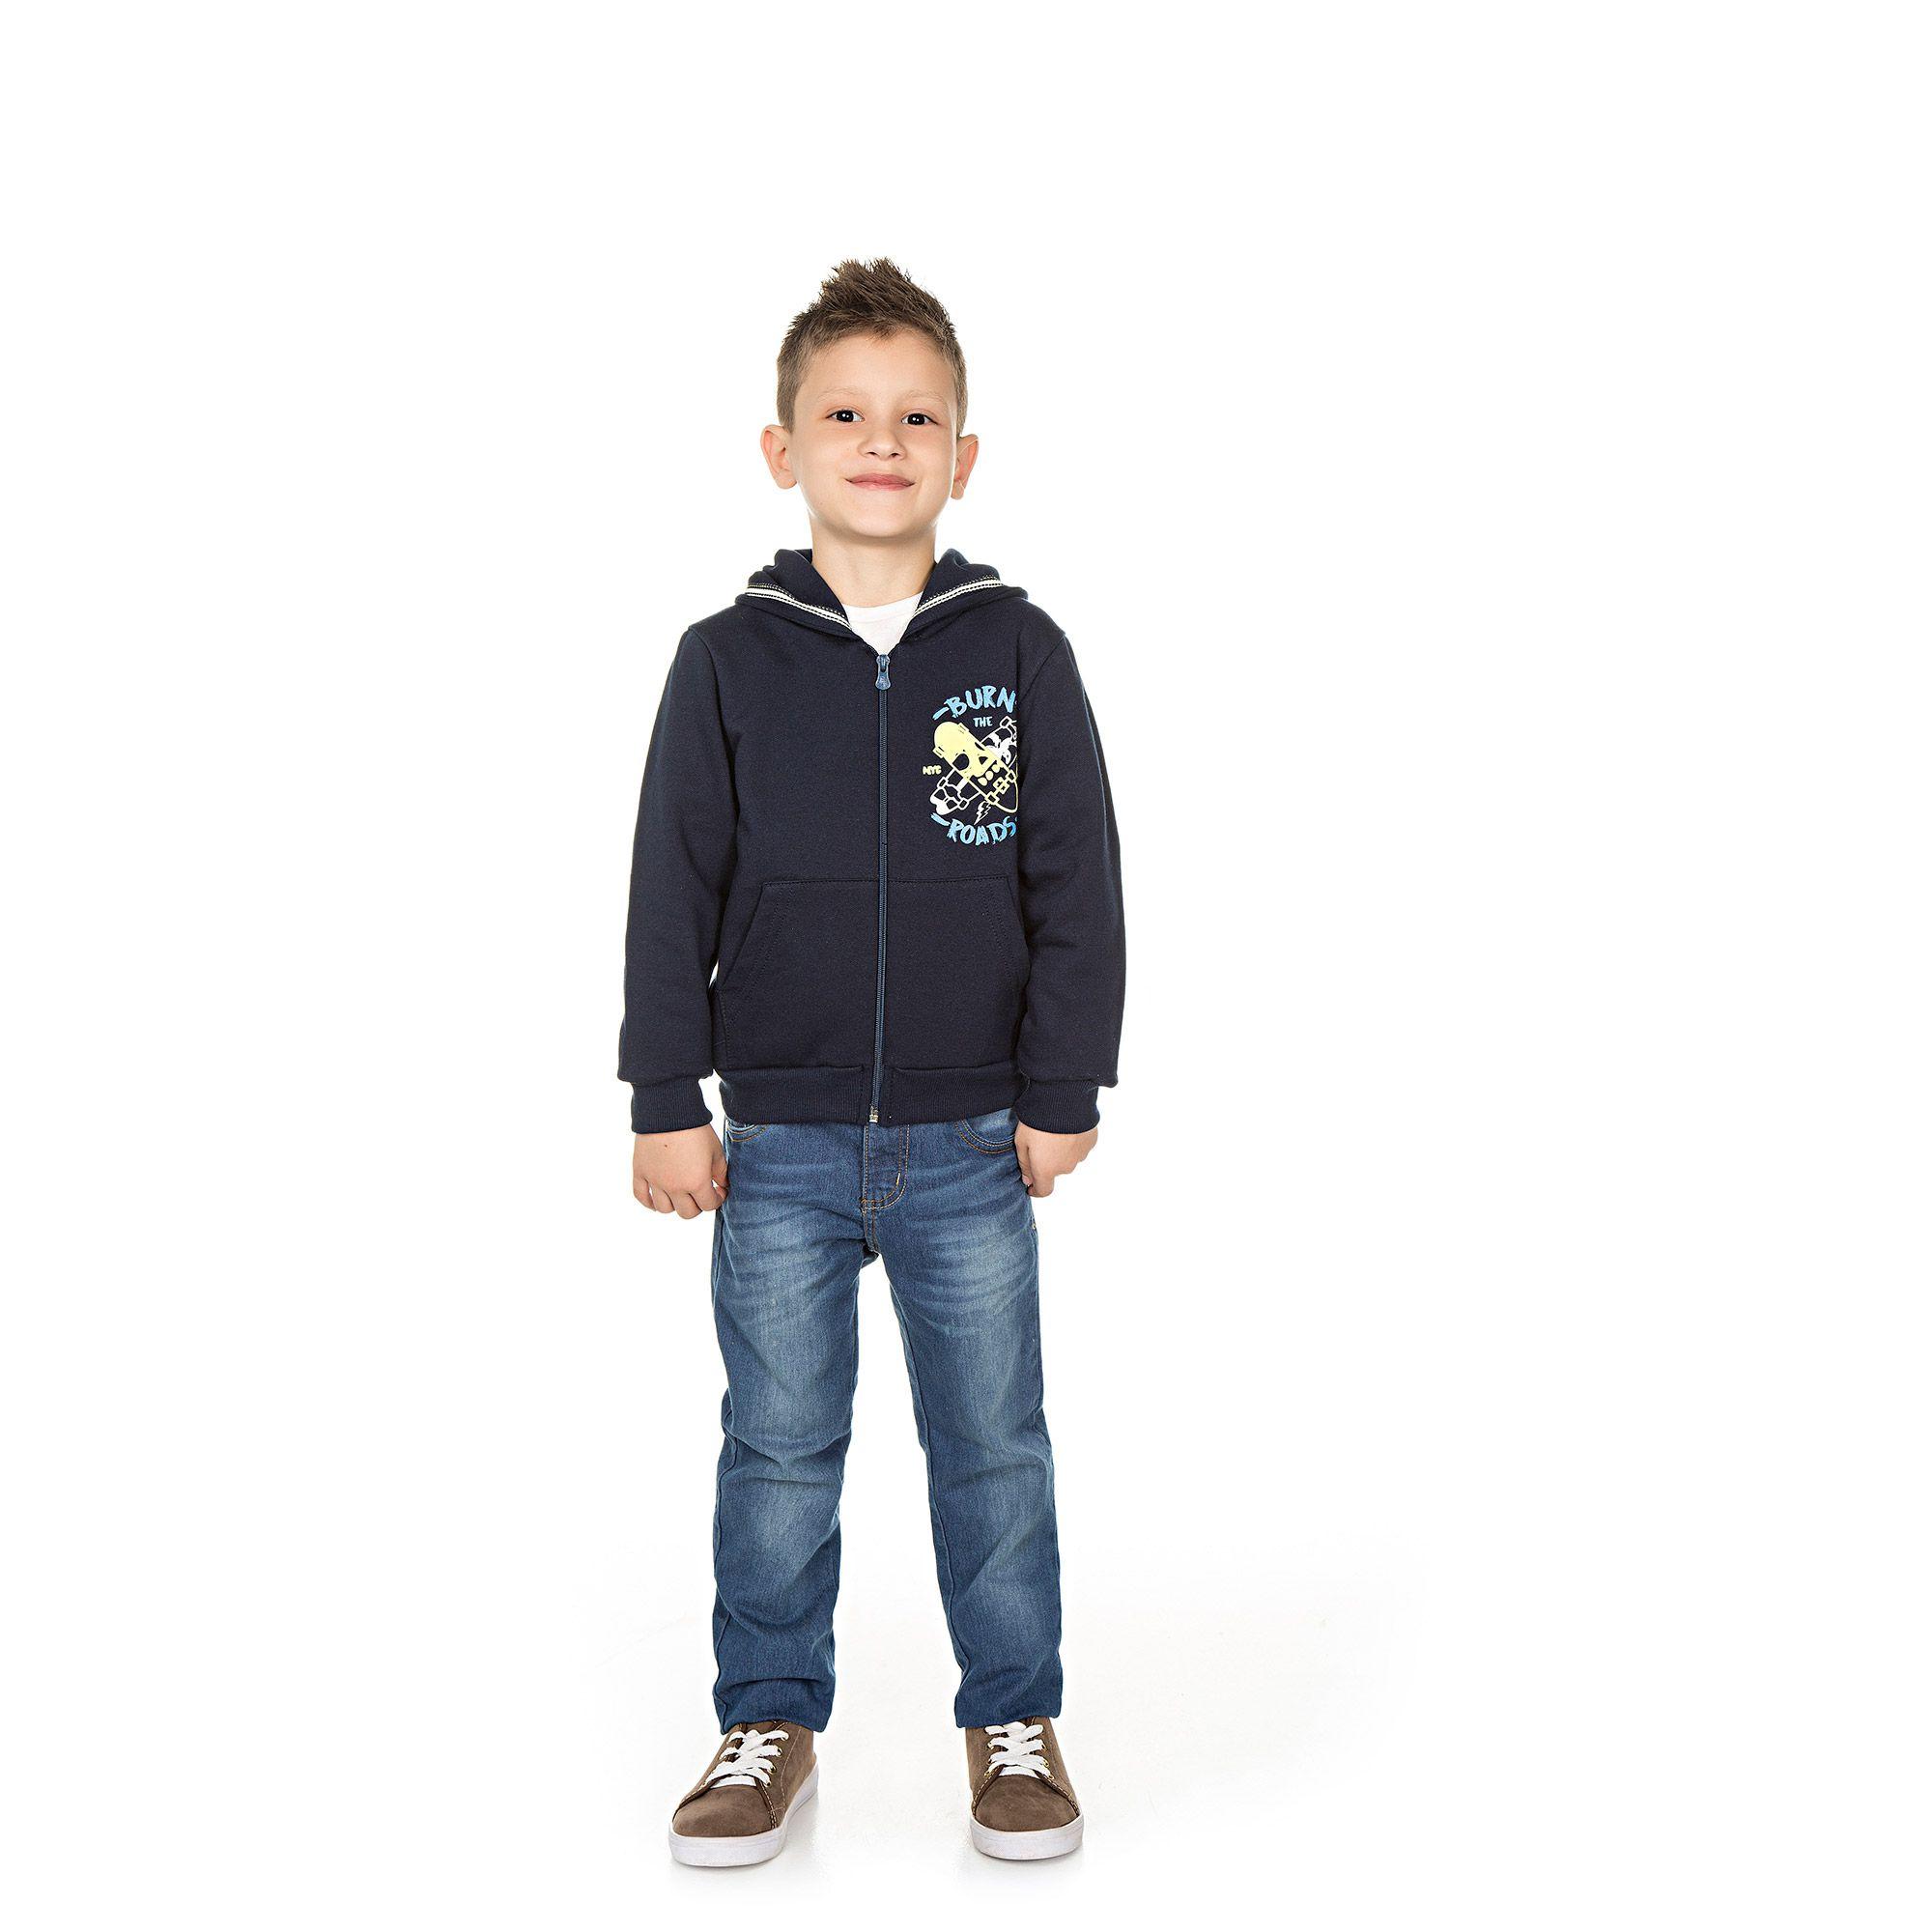 Jaqueta Infantil Masculino  - Ref 5025 - Marinho